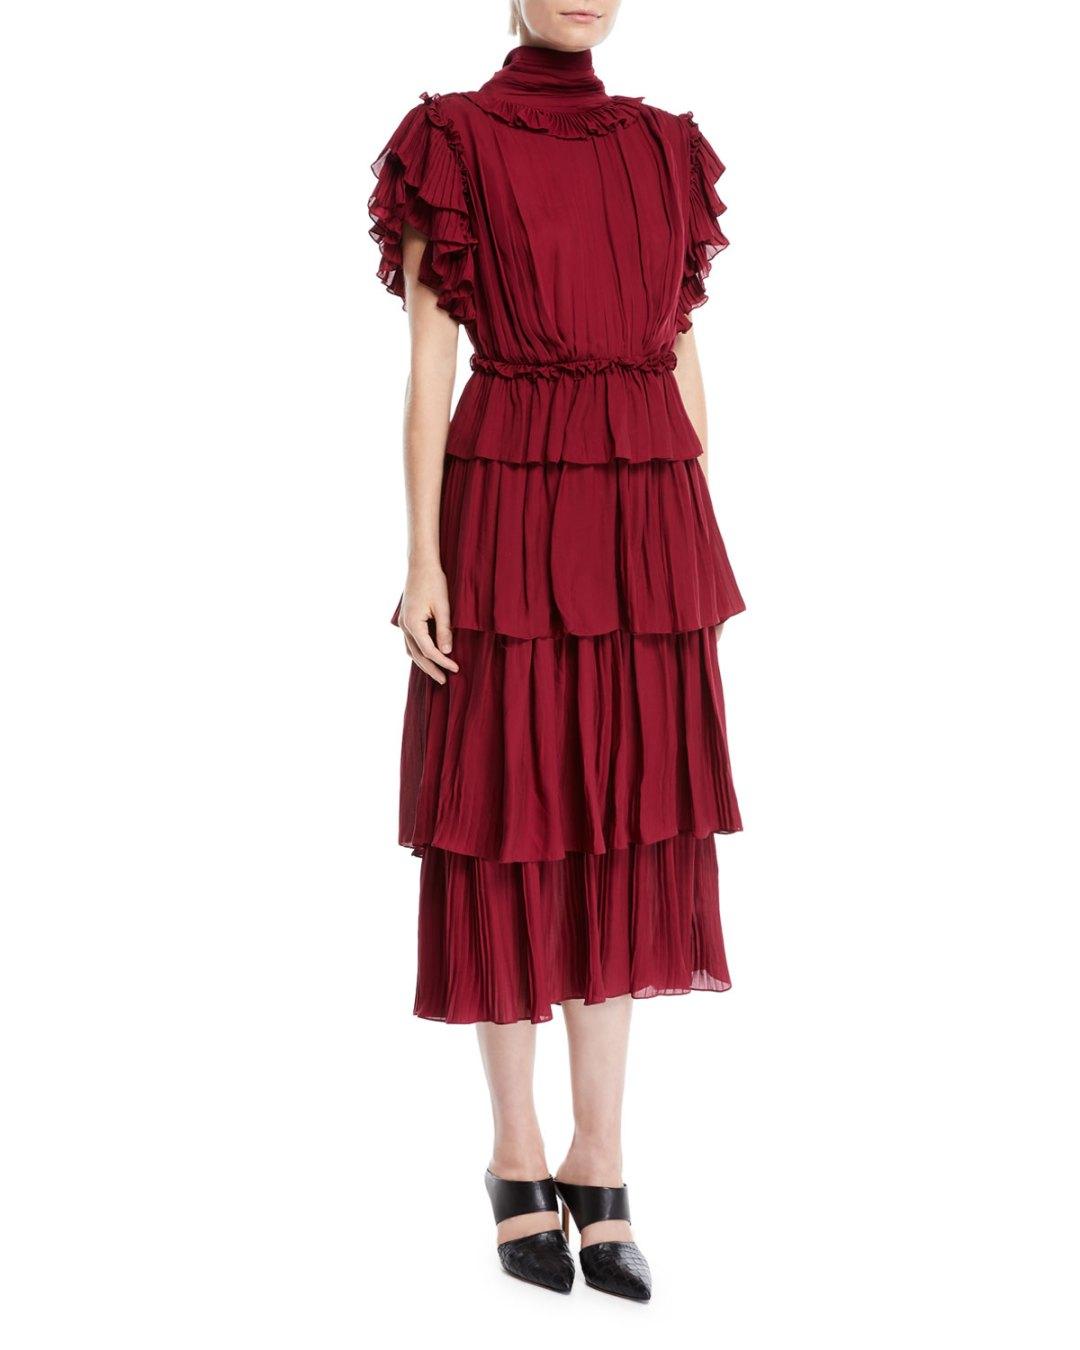 Fashionweek Fashion Week Tendencies Sling Bag Twin Side Pocket Burgundy Maroon Johanna Ortiz One Shoulder Cotton Eyelet Maxi Dress W Bow Top Bergdorf Goodman Neiman Marcus 175000